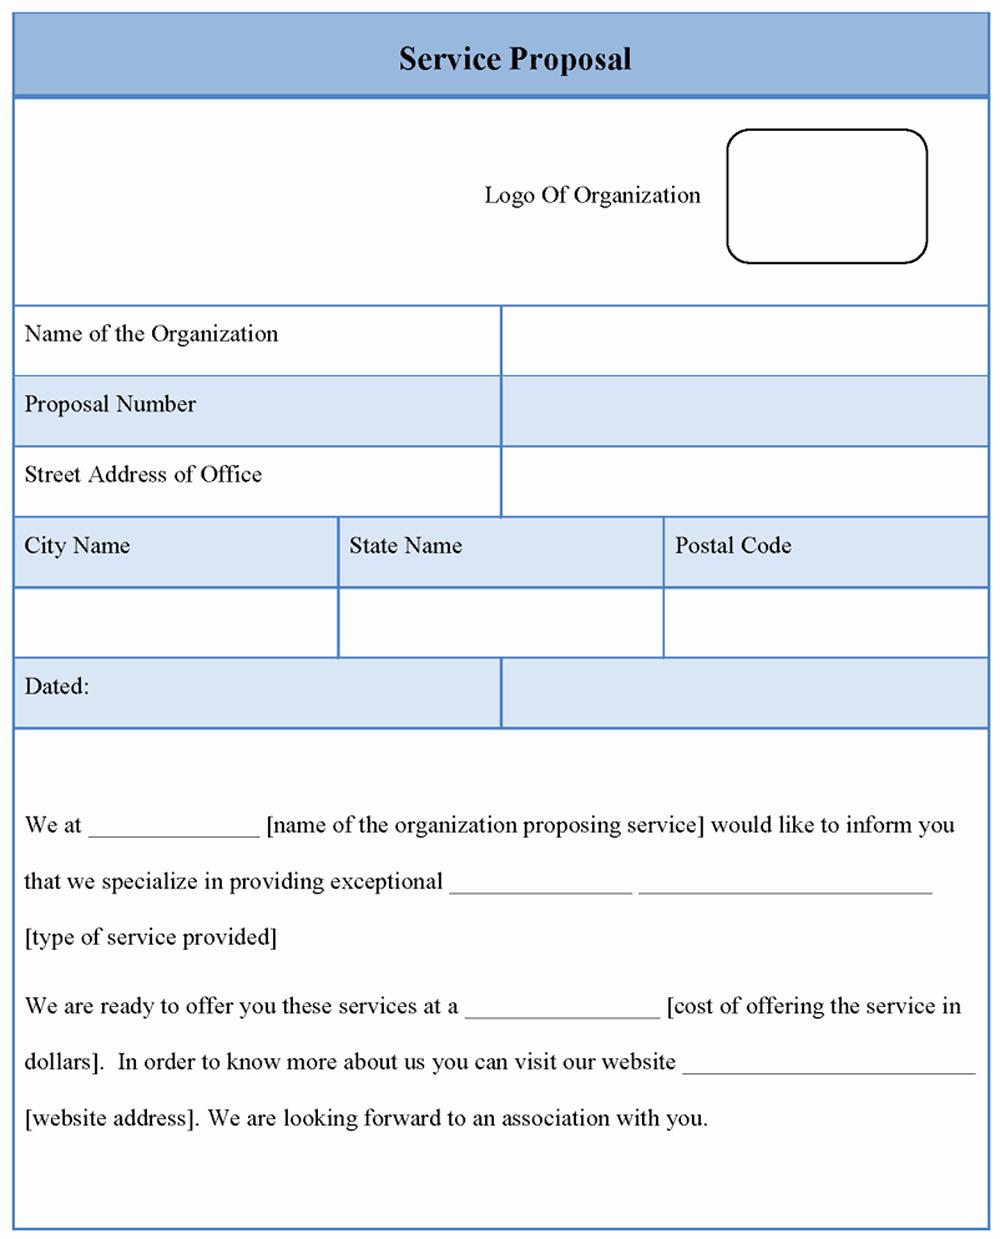 Service Proposal Template Word Unique Proposal Template for Service Sample Of Service Proposal